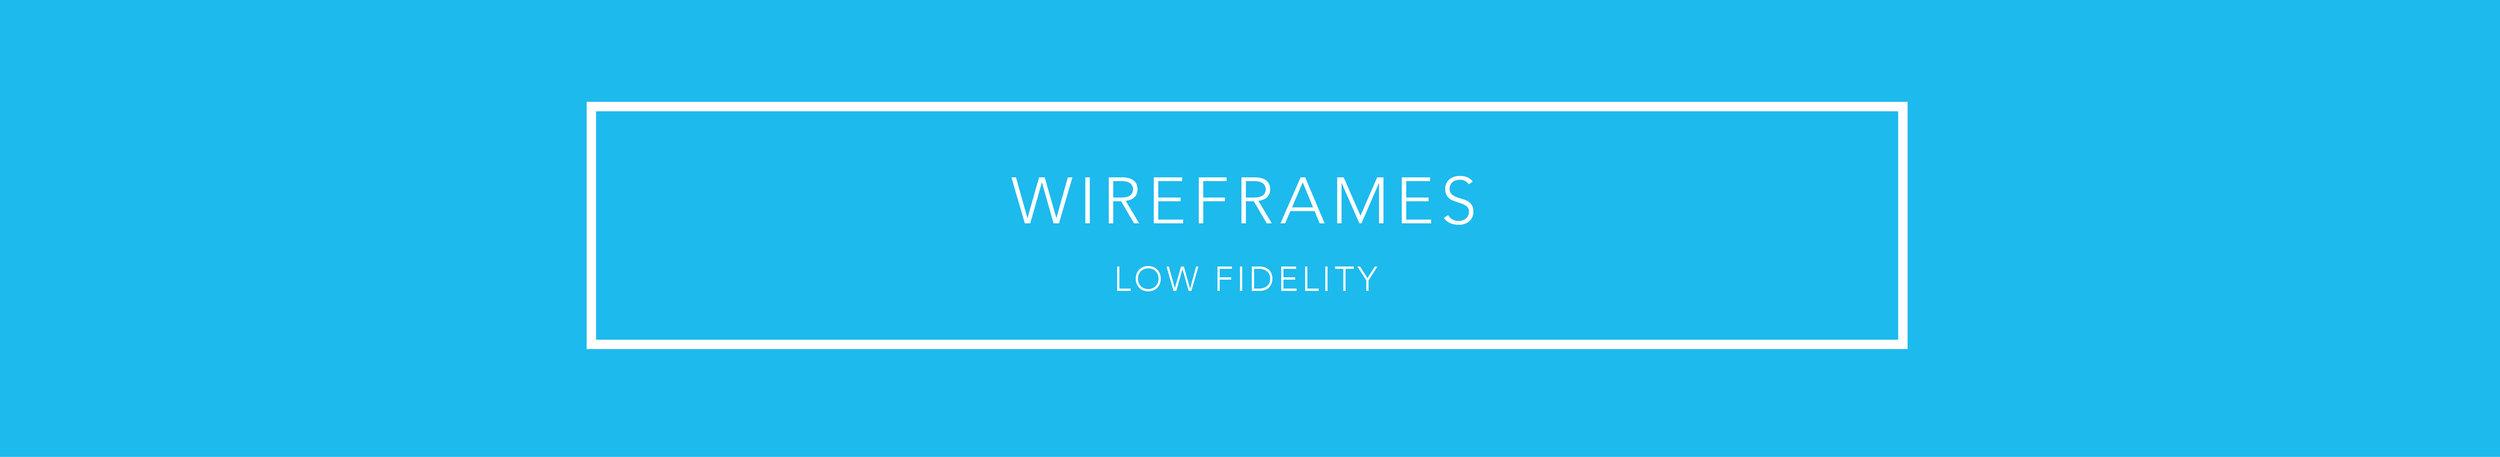 NG_wireframes-05.jpg